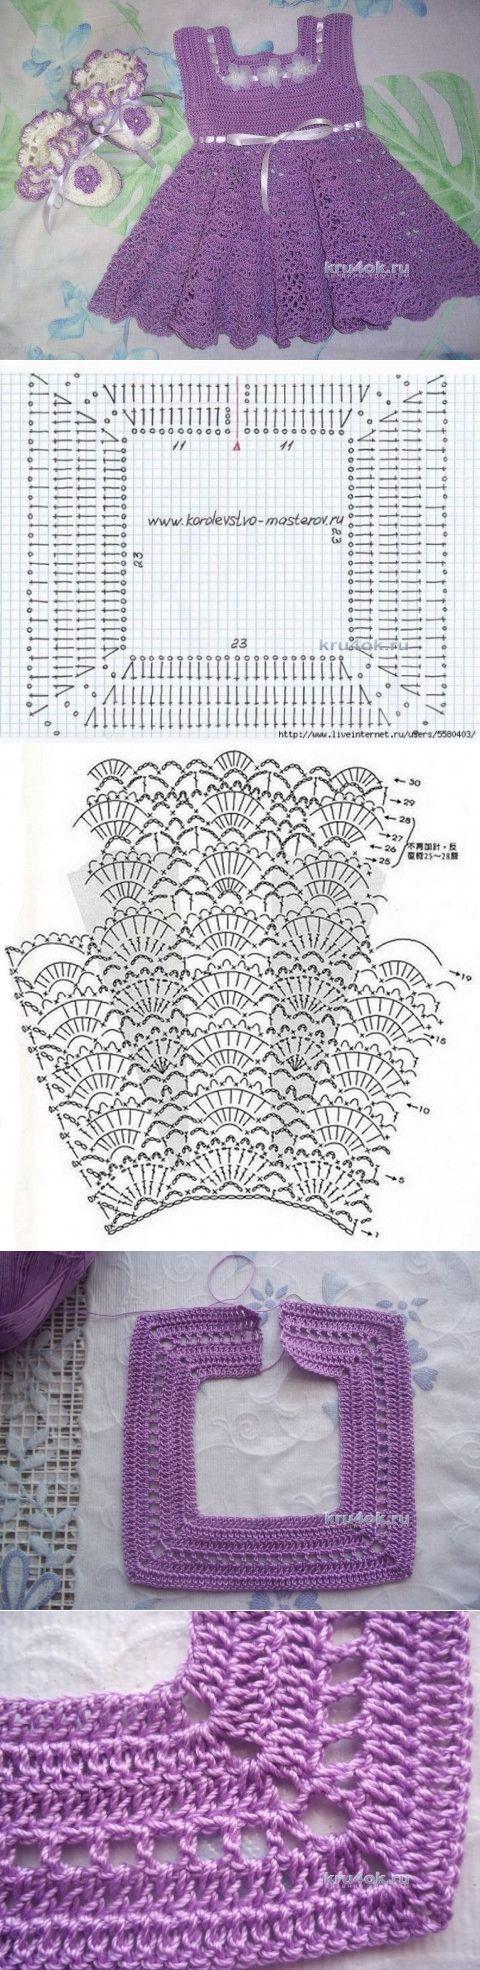 Сарафан для девочки. Работа Татьяны Власенко - вязание крючком на kru4ok.ru [] #<br/> # #Crochet #Girls,<br/> # #Crochet #Dresses,<br/> # #Crochet #Baby,<br/> # #Bicarbonate,<br/> # #Children,<br/> # #Posts,<br/> # #Knit #Dresses,<br/> # #Bebe,<br/> # #Crochet<br/>